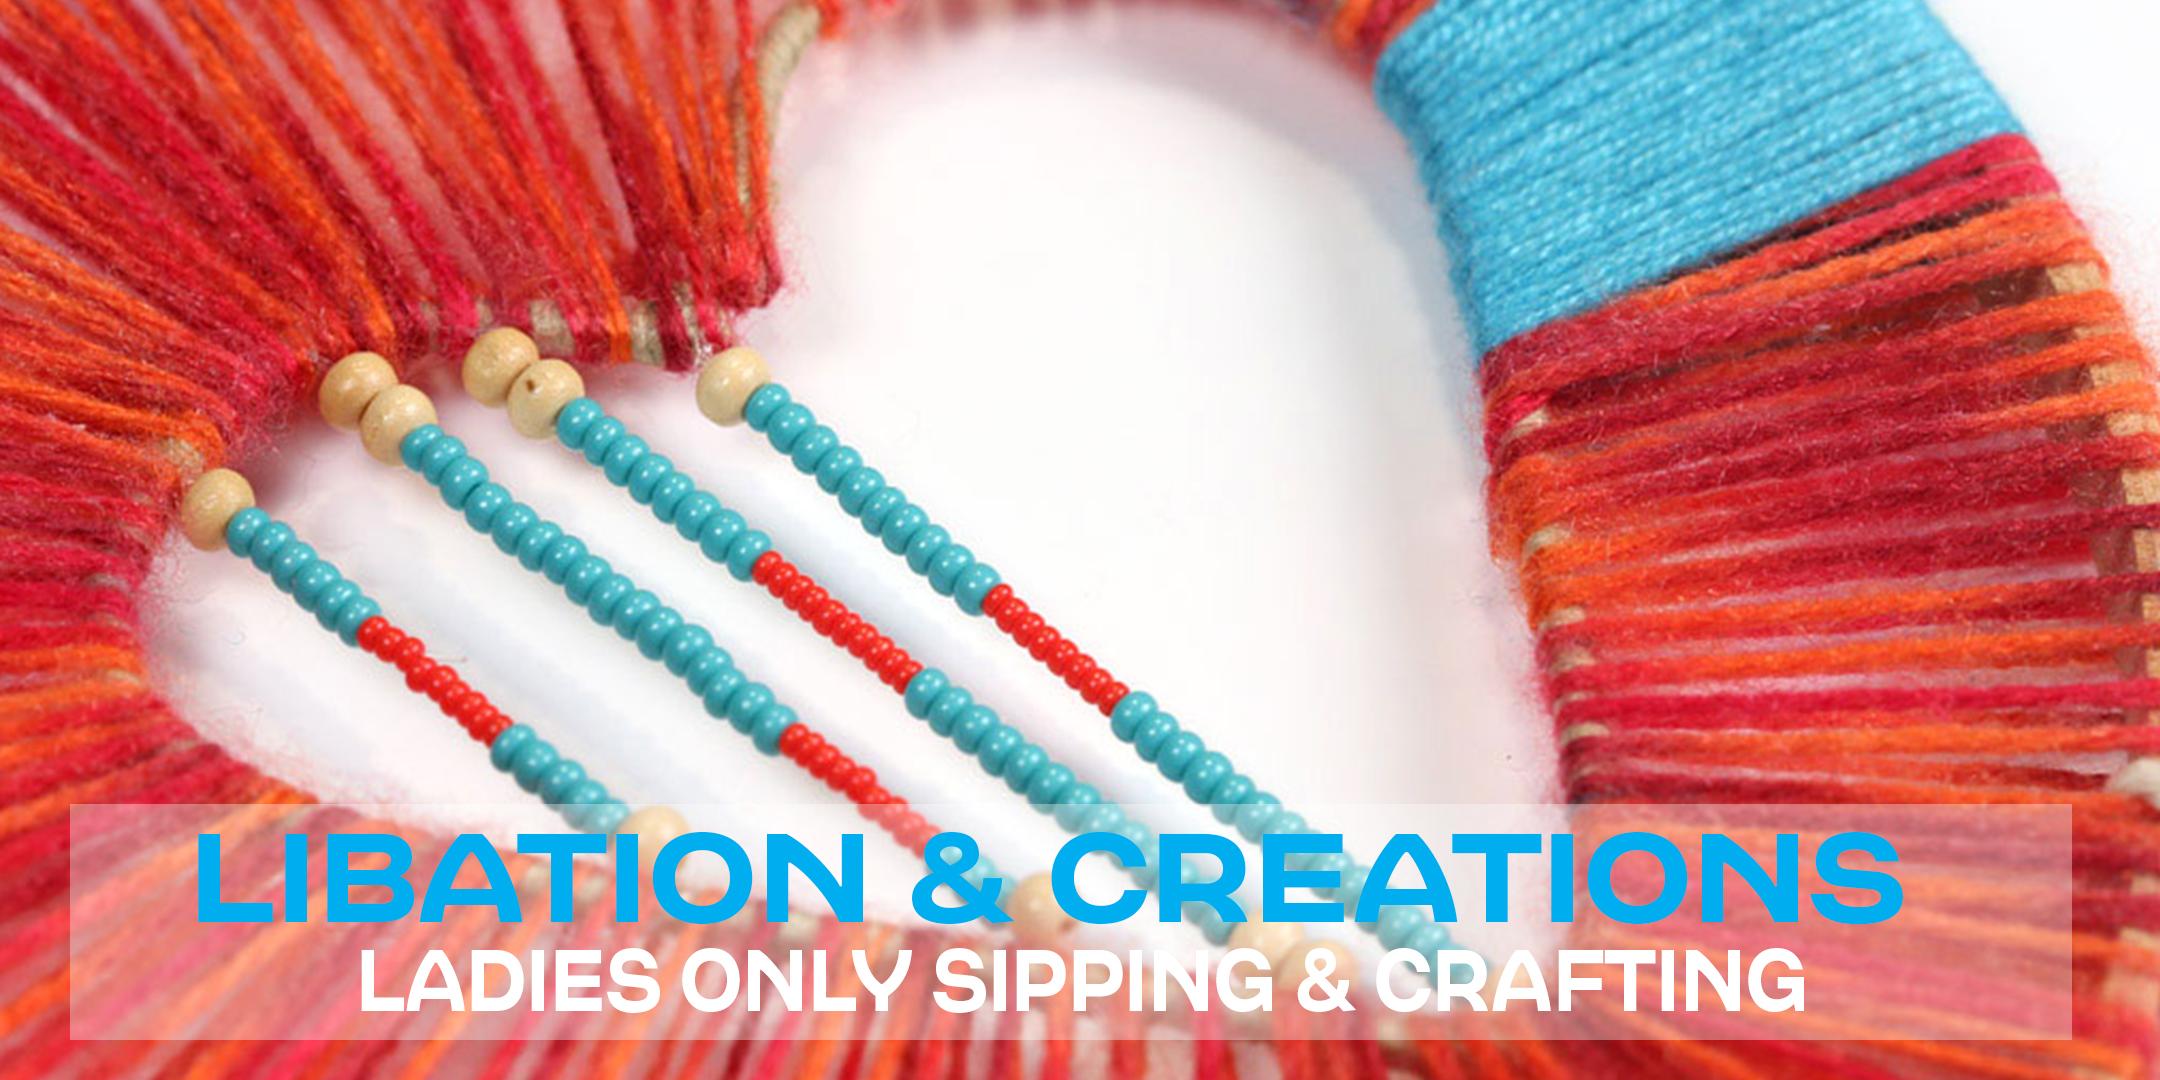 libation-creation.jpg